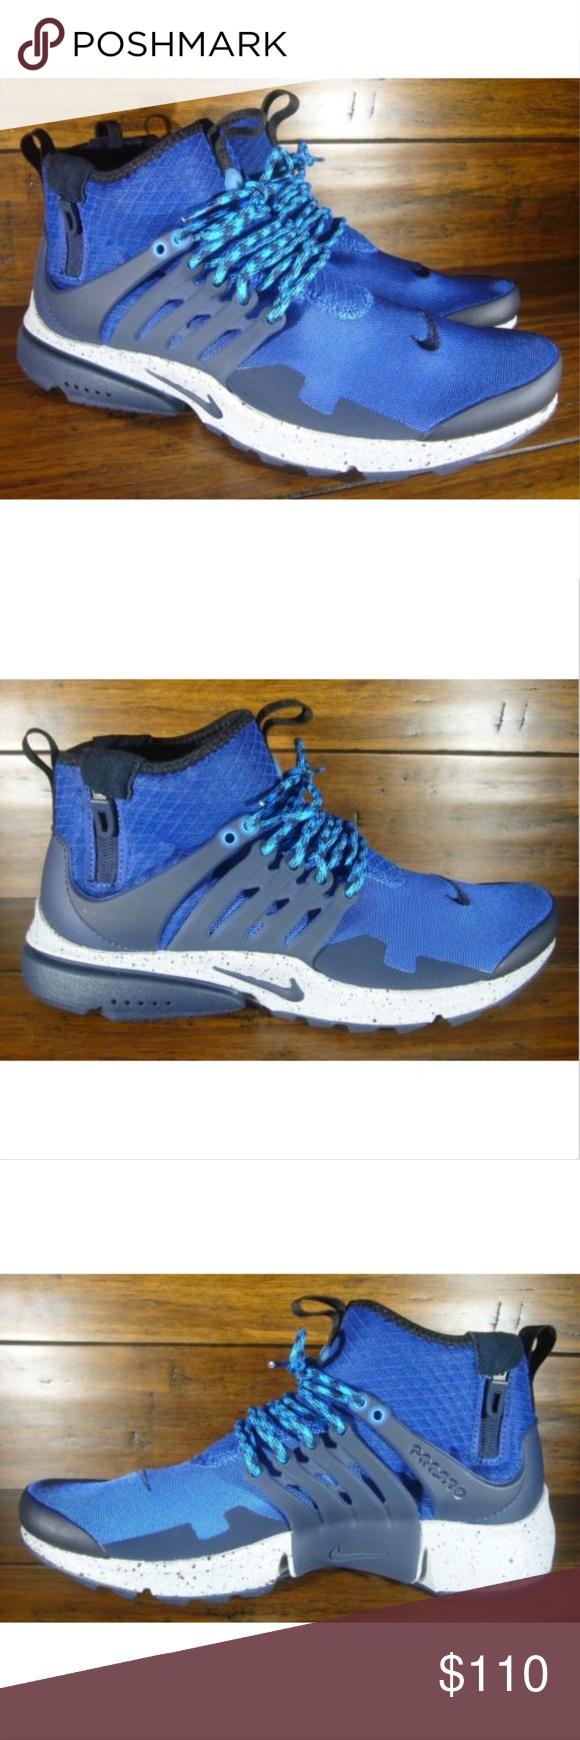 quality design fde14 3b716 Nike Men s Air Presto Mid Utility Gym Blue Grey Nike Air Presto Mid Utility  Gym